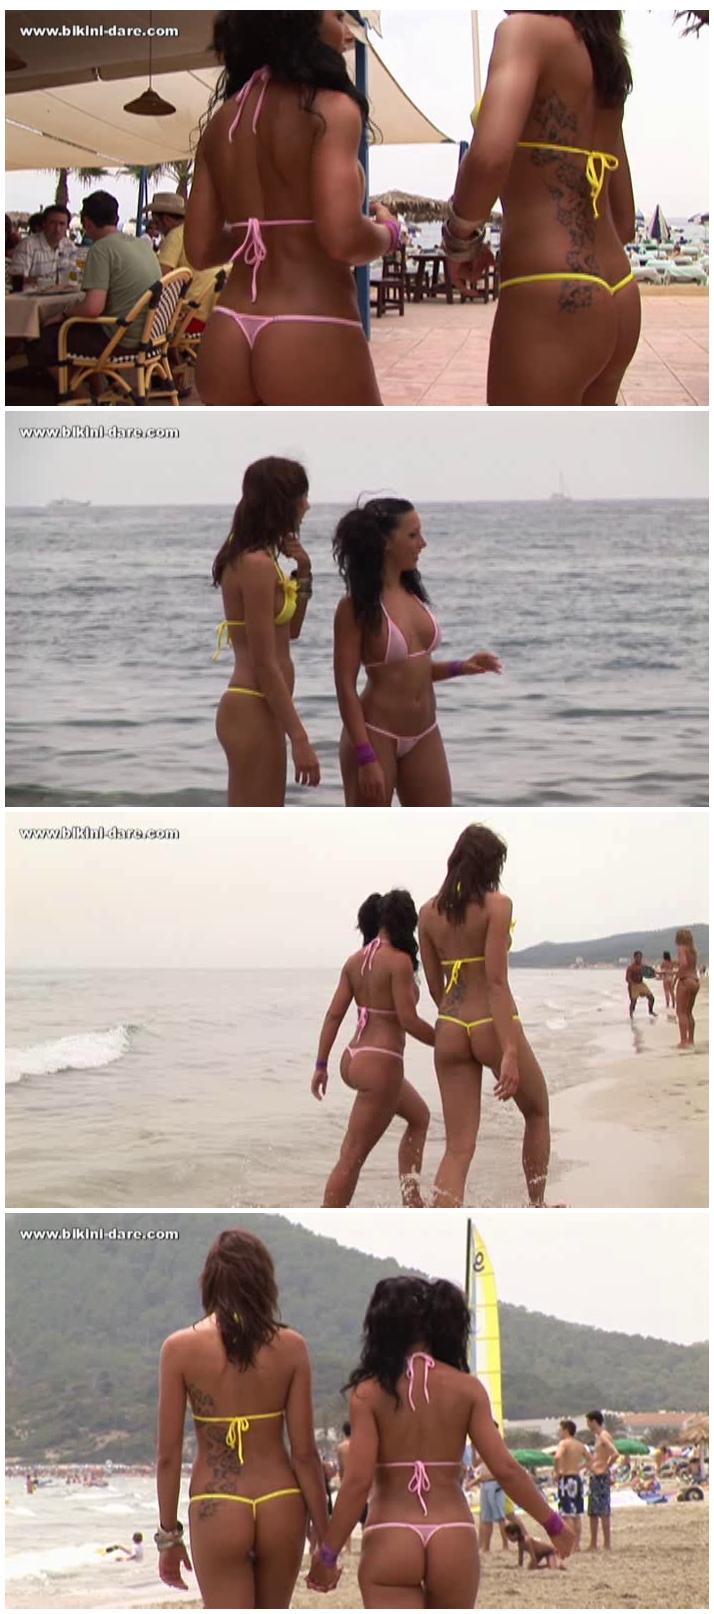 bikini-dare073_cover.jpg